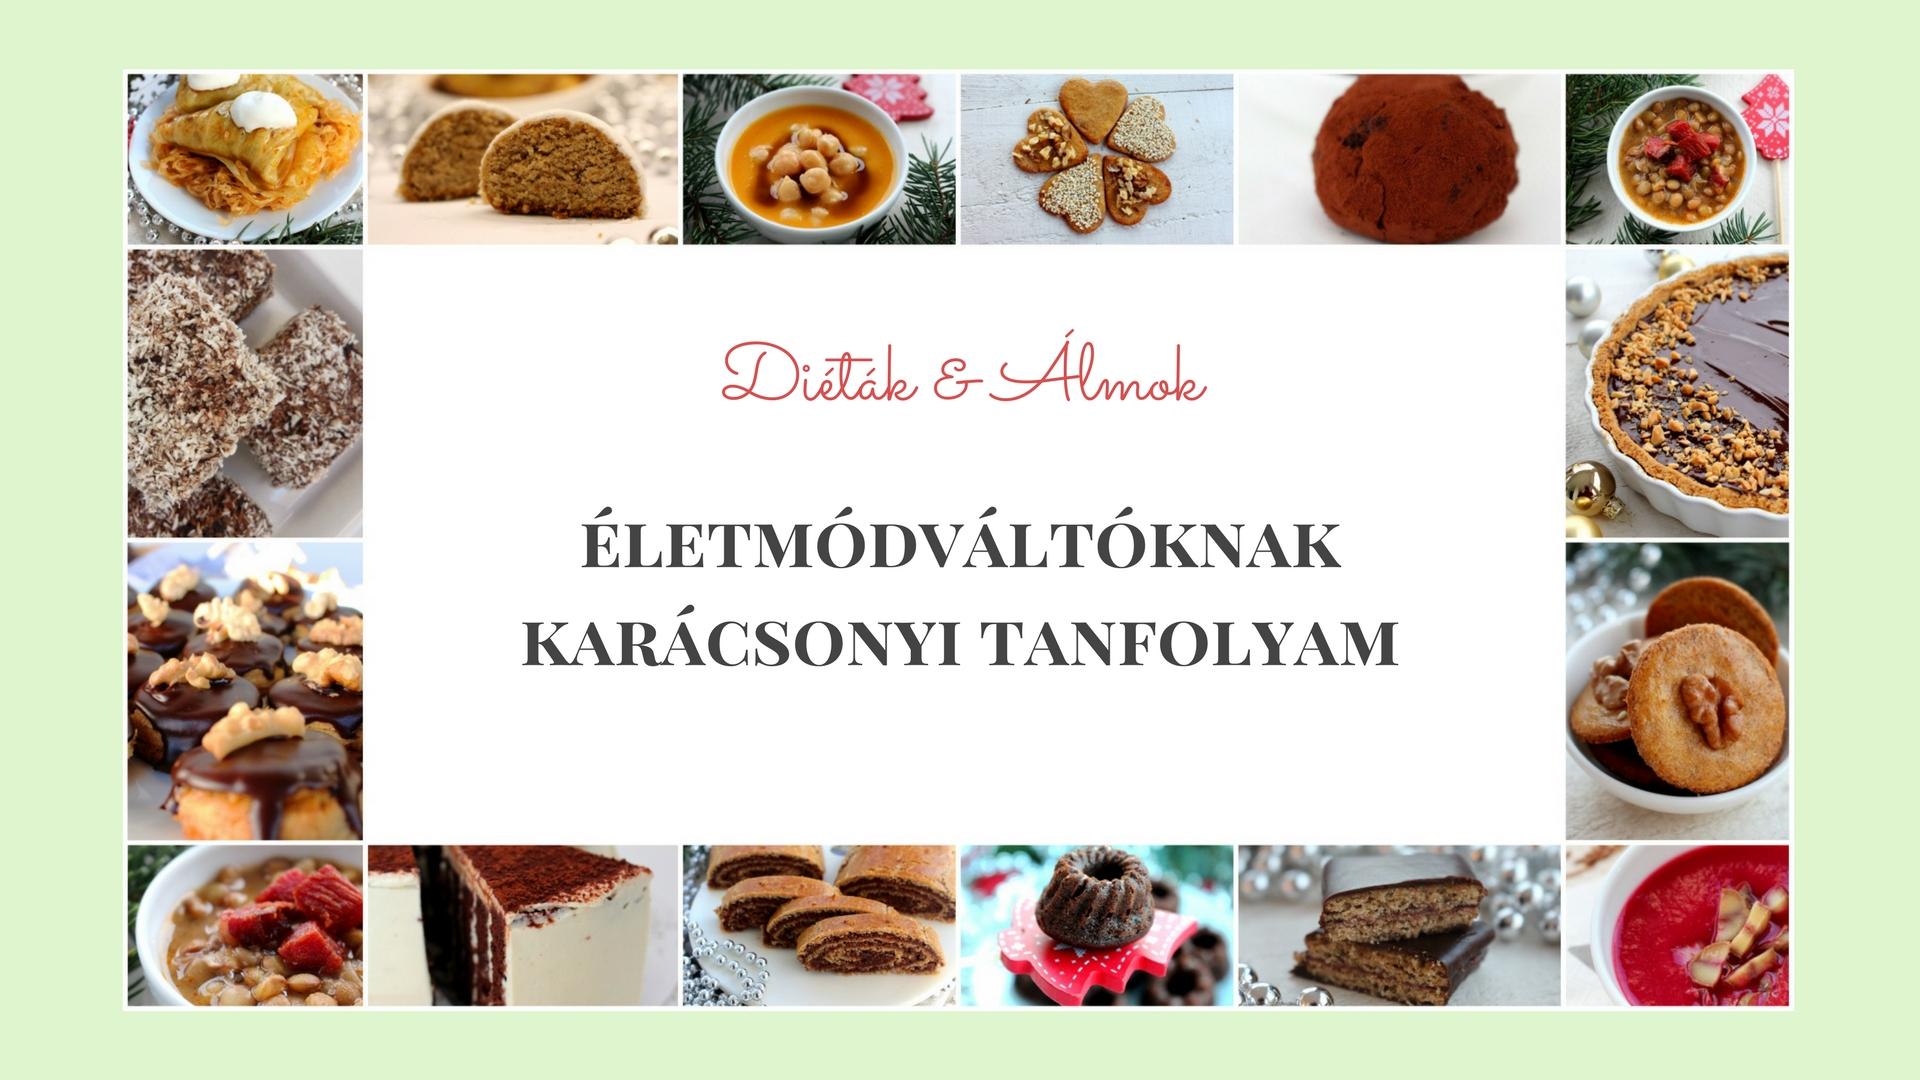 dietak_almok_karacsonyi_szenhidrat_dieta_tanfolyam_2017_eletmodvaltas.jpg